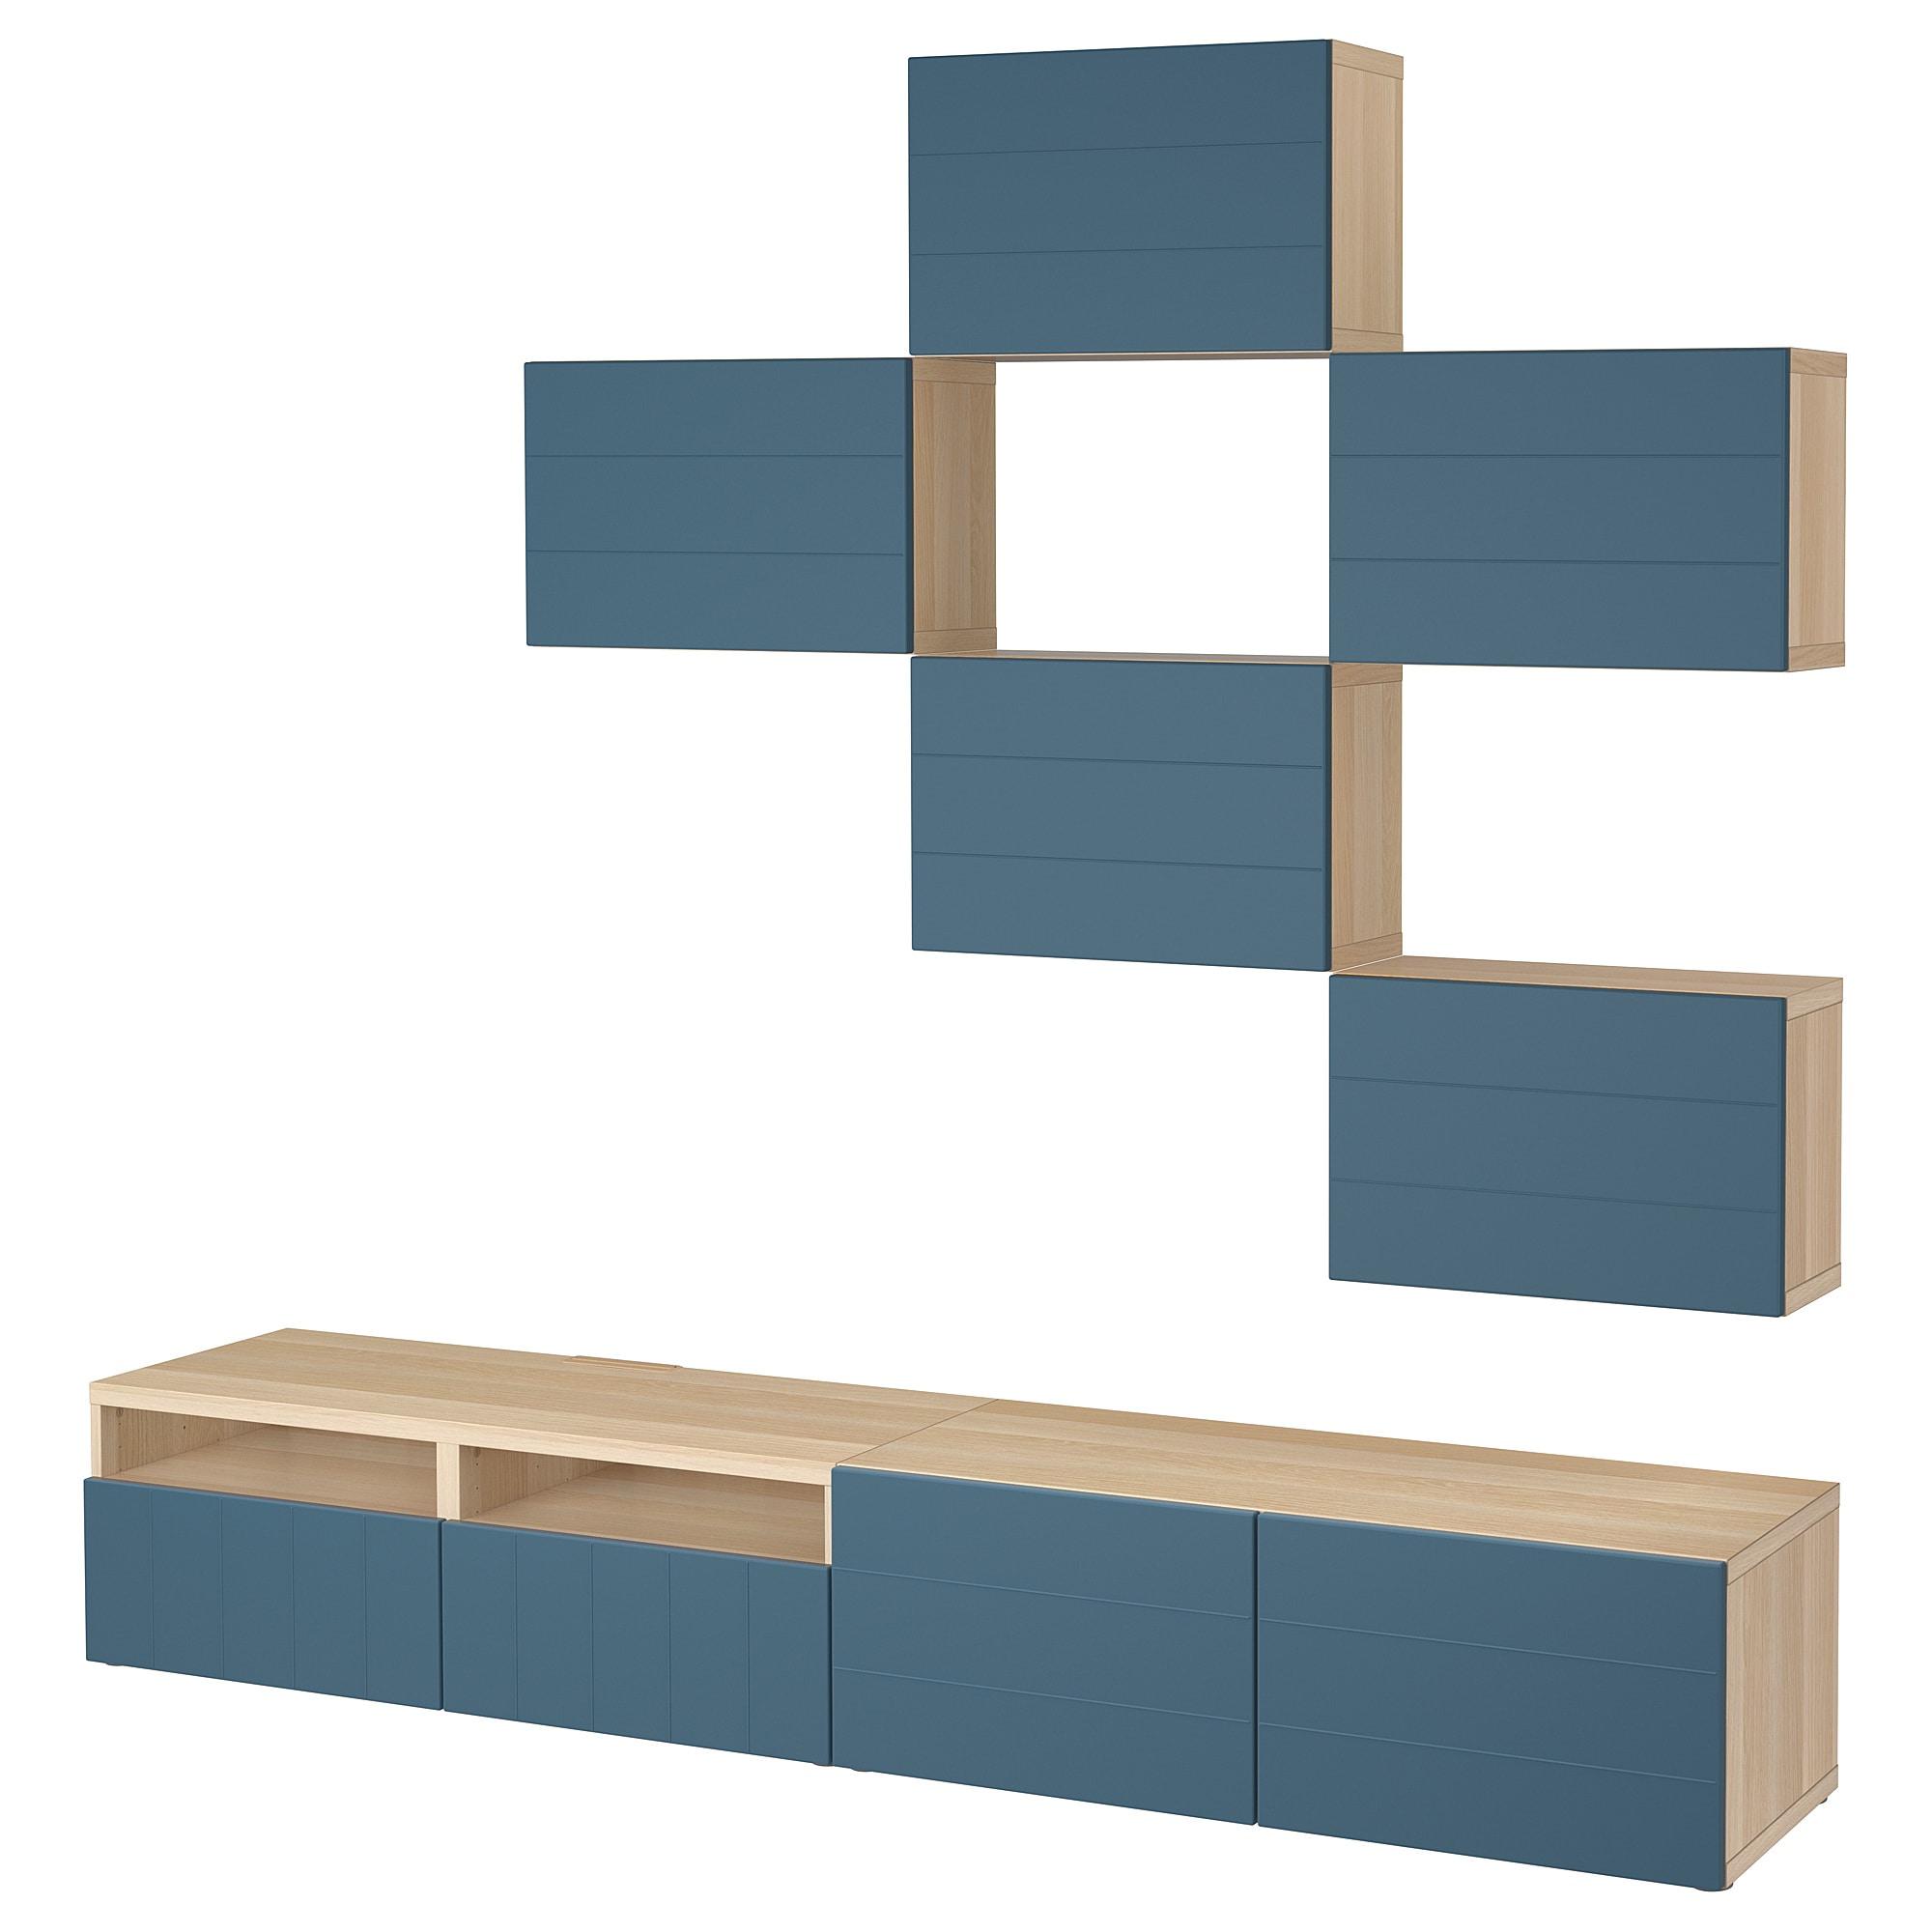 Шкаф для ТВ, комбинация БЕСТО темно-синий артикуль № 592.761.29 в наличии. Онлайн магазин IKEA Республика Беларусь. Недорогая доставка и монтаж.